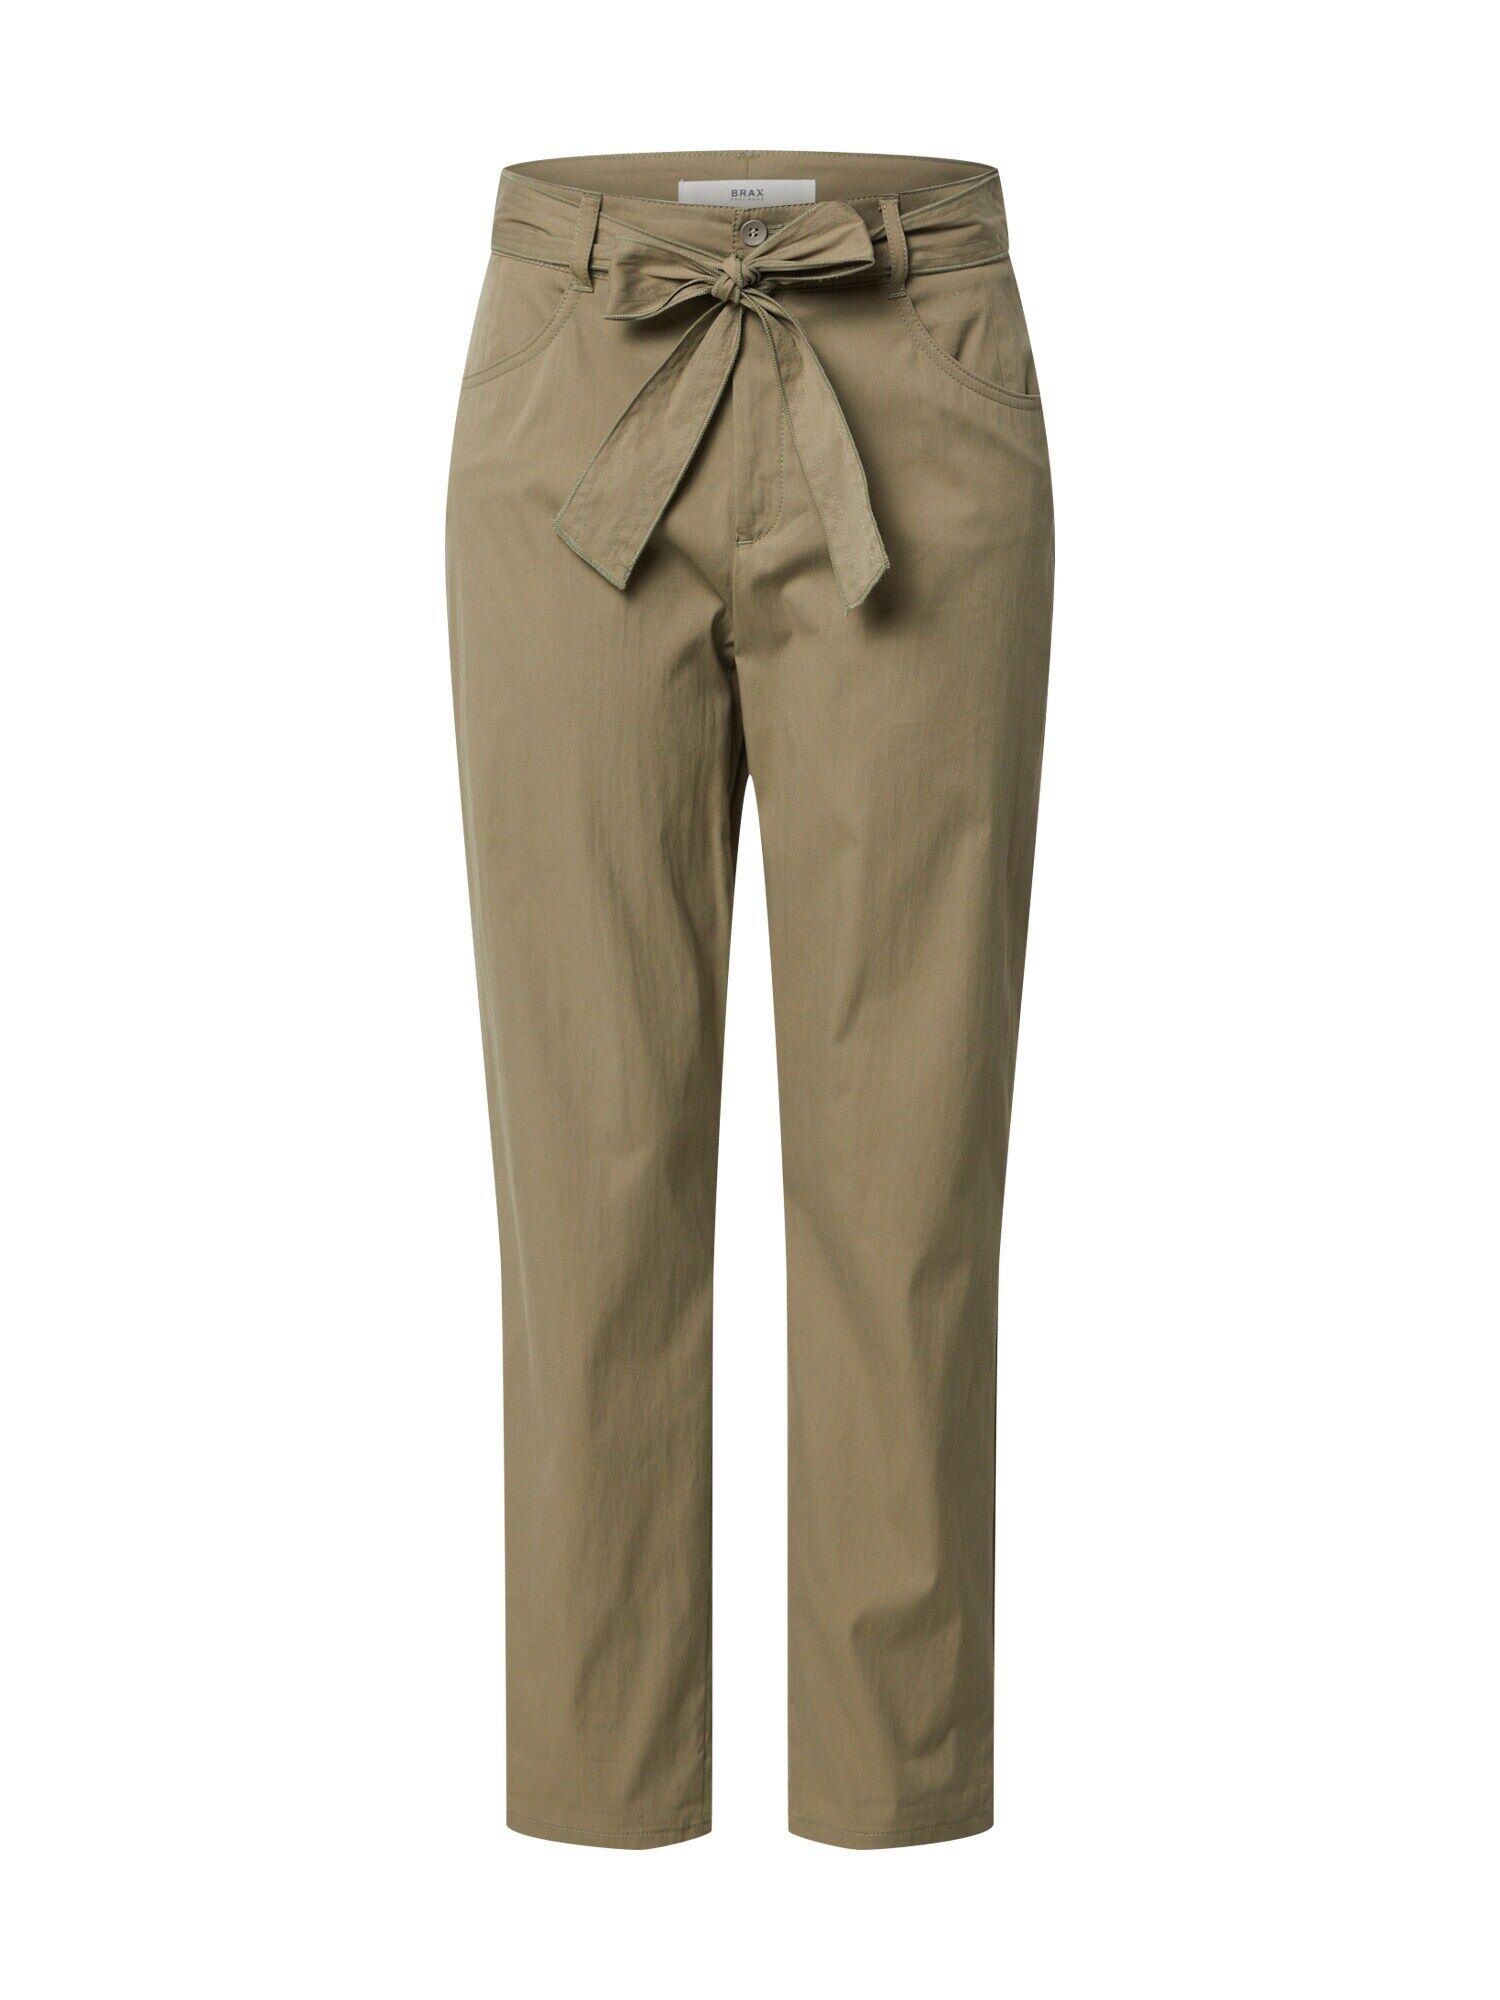 BRAX Pantalon 'Melo'  - Vert - Taille: 42 - female